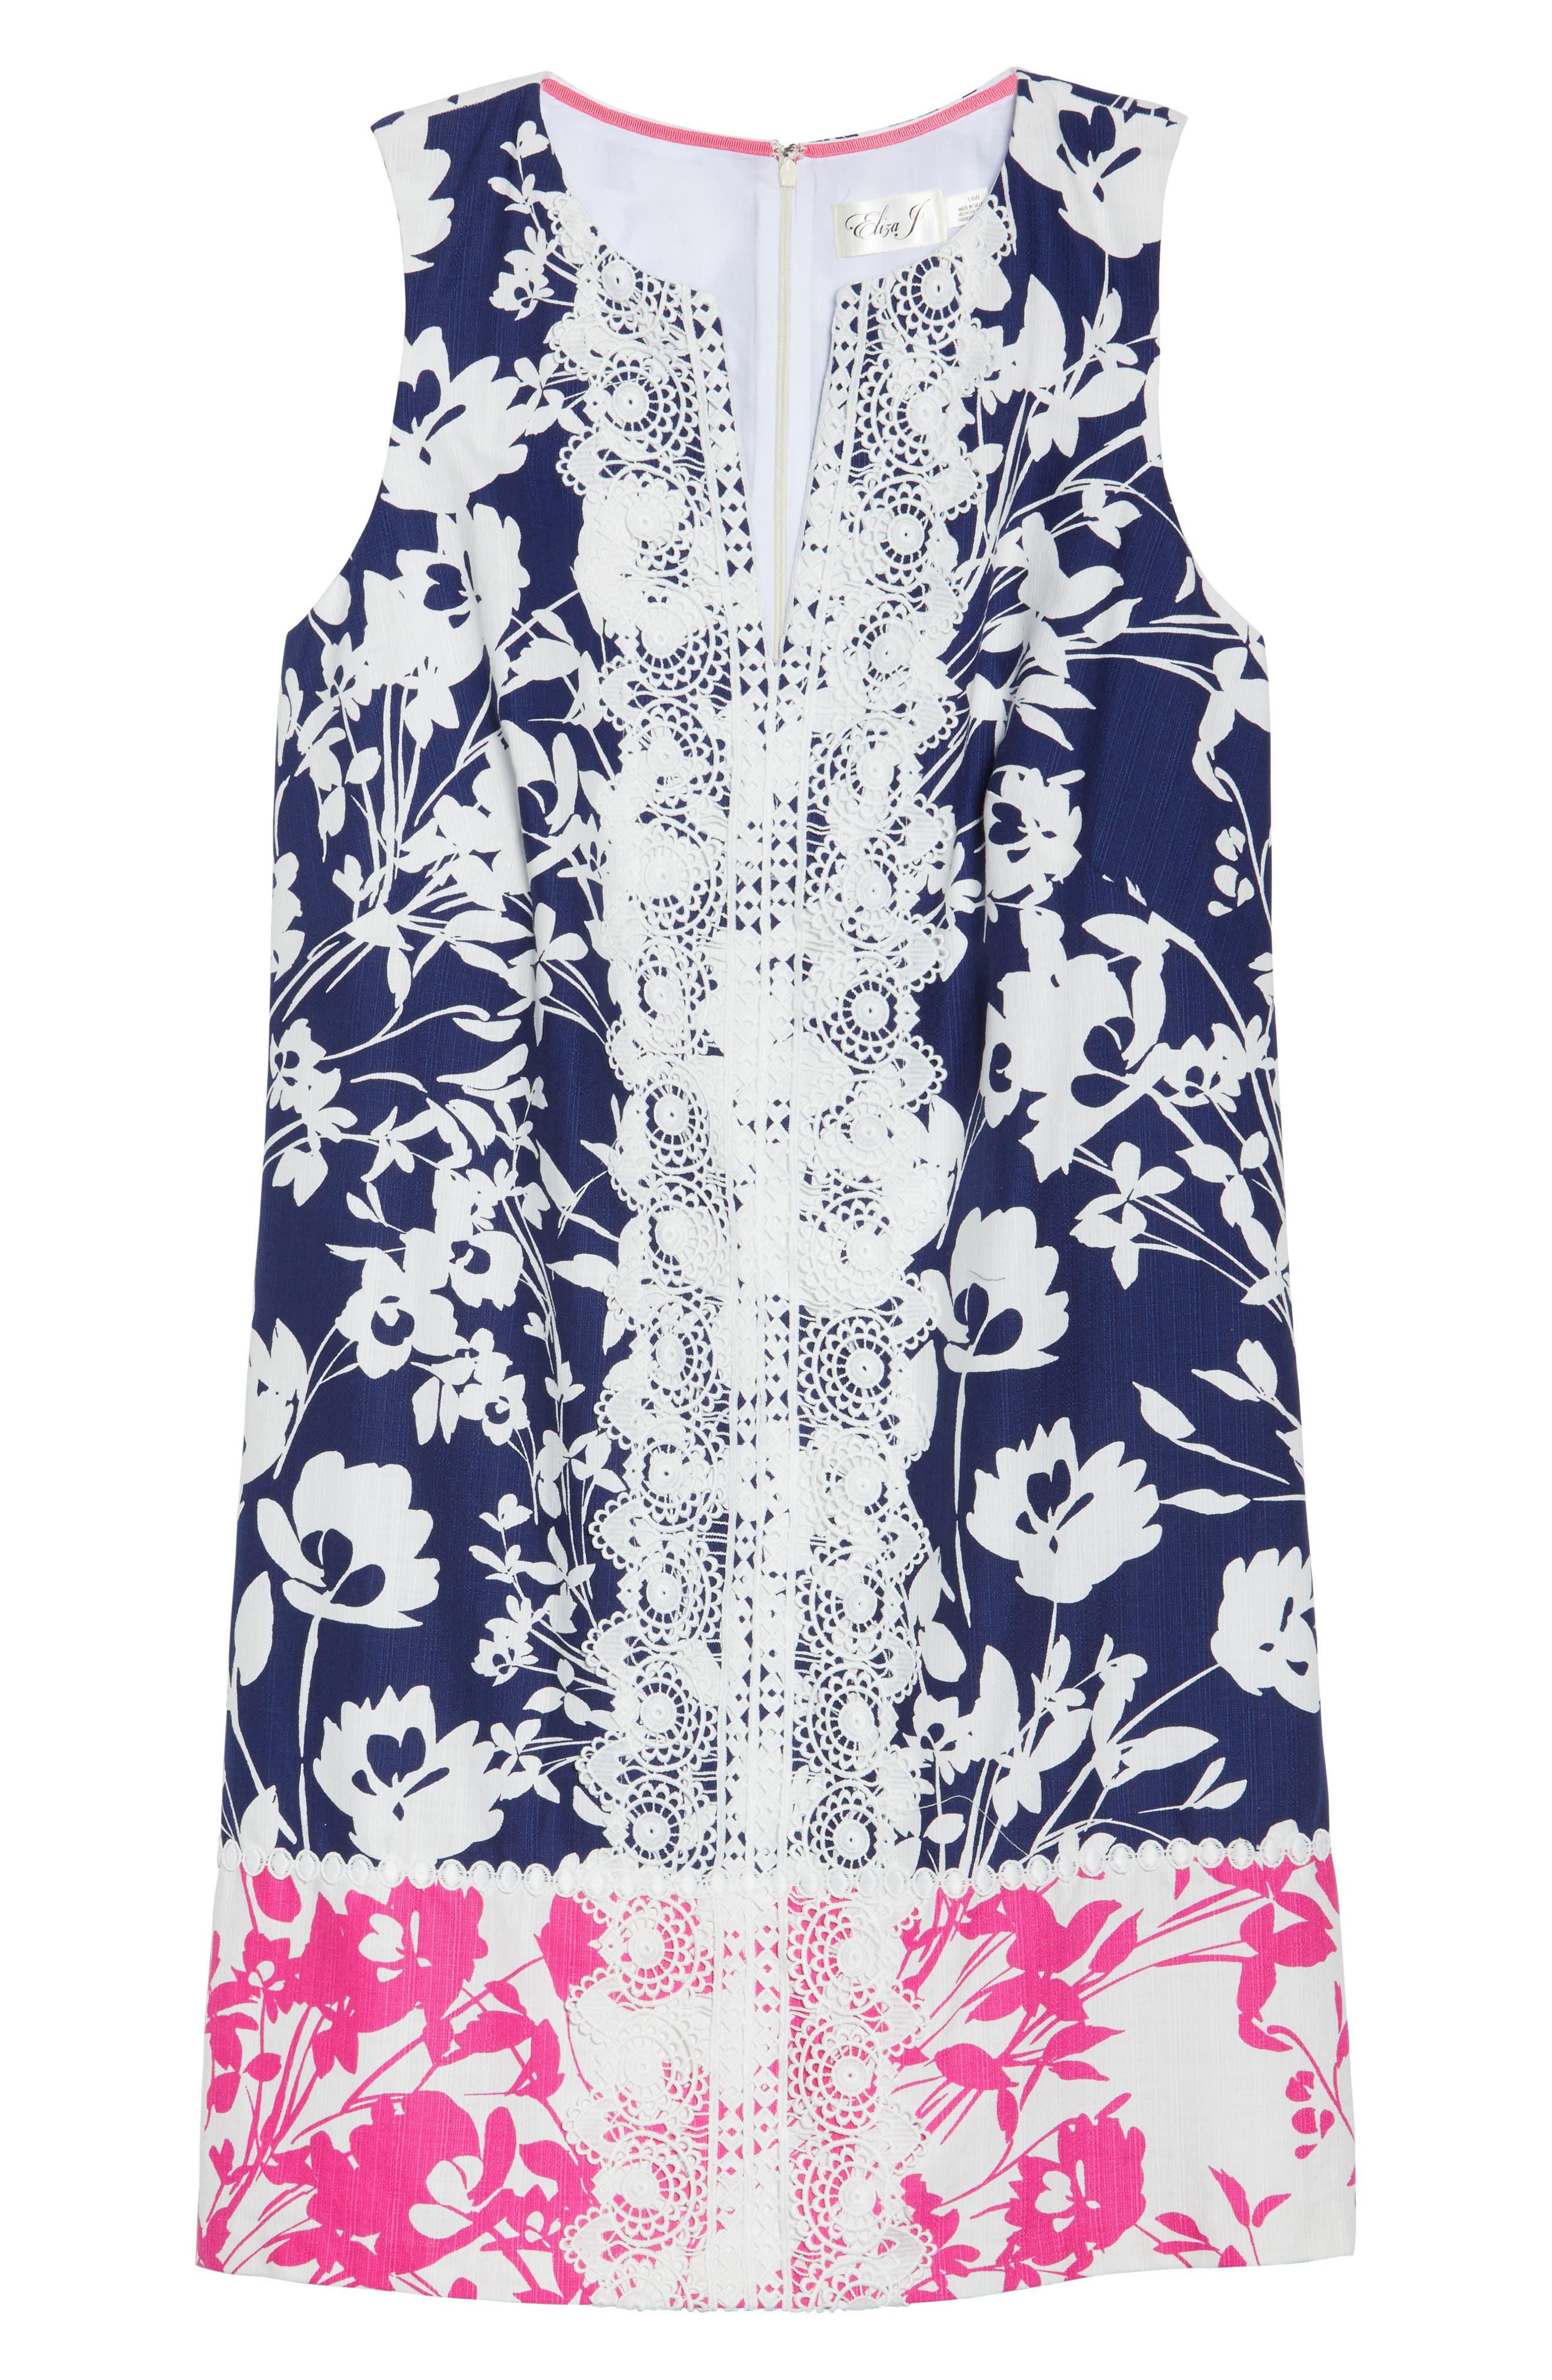 Lace Trim Two Tone Print Shift Dress,                             Alternate thumbnail 6, color,                             Navy/ Pink